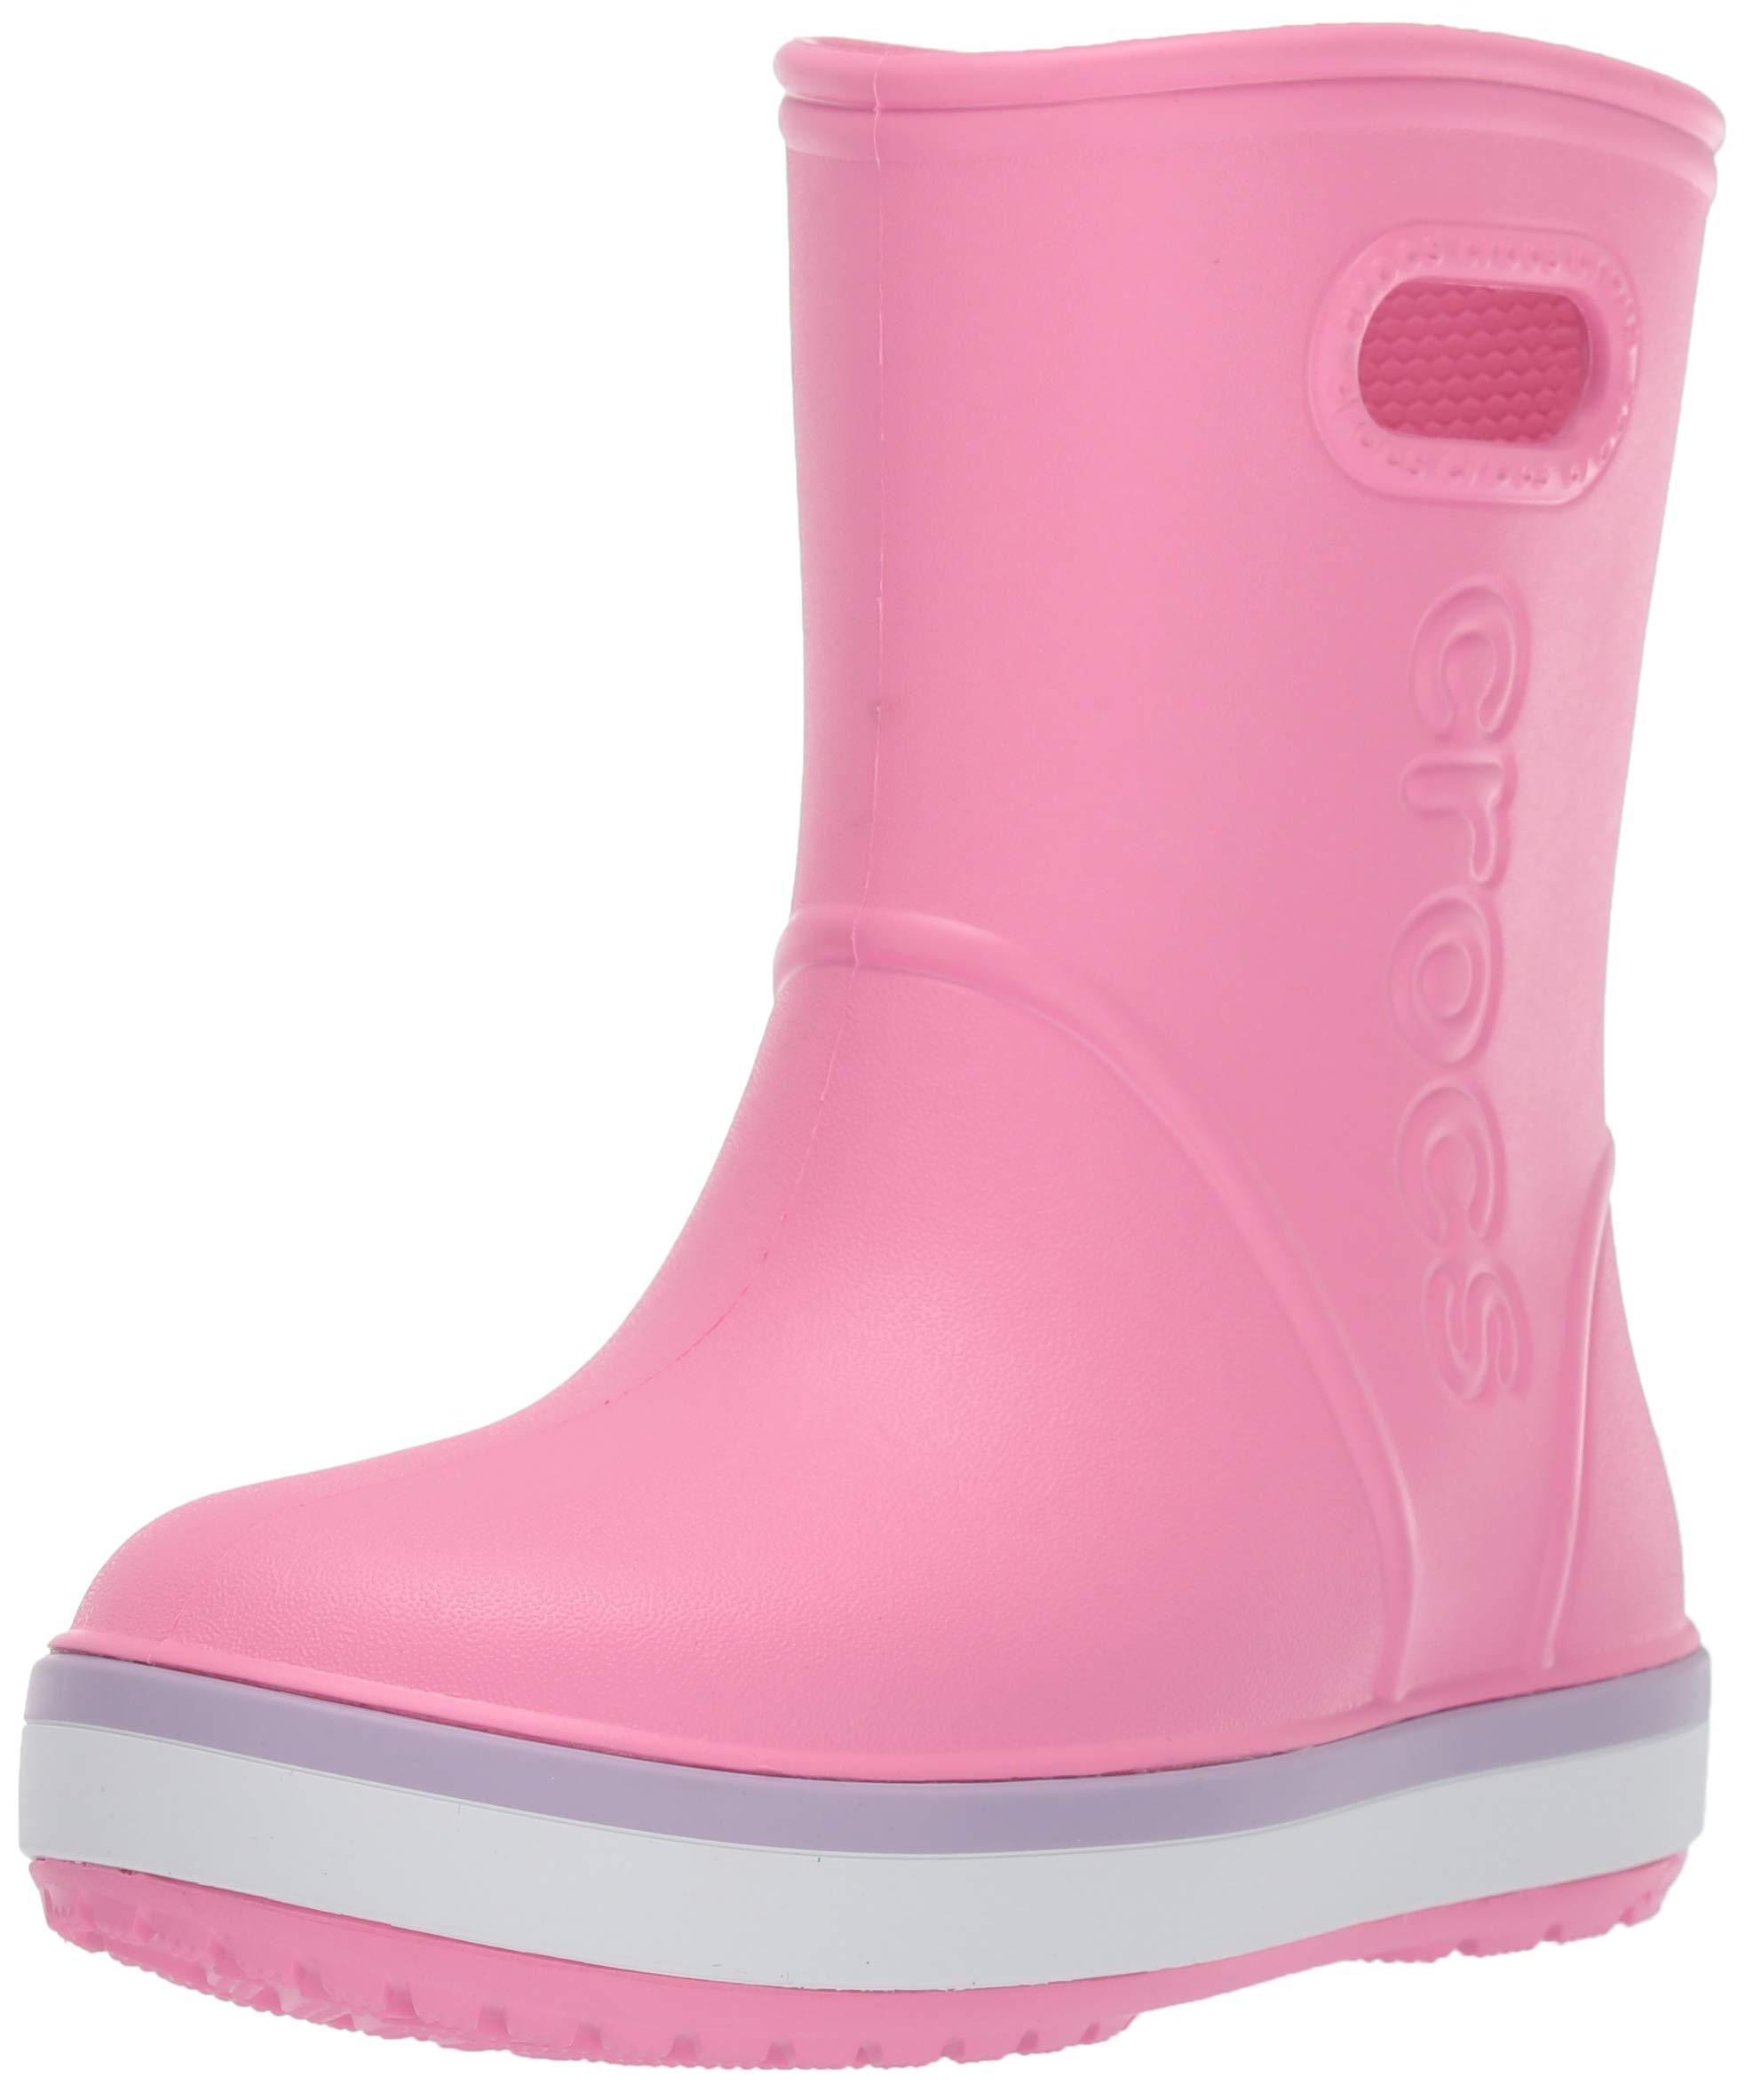 Crocs Unisex Crocband Rain Boot, Pink Lemonade/Lavender, 11 M US Little Kid